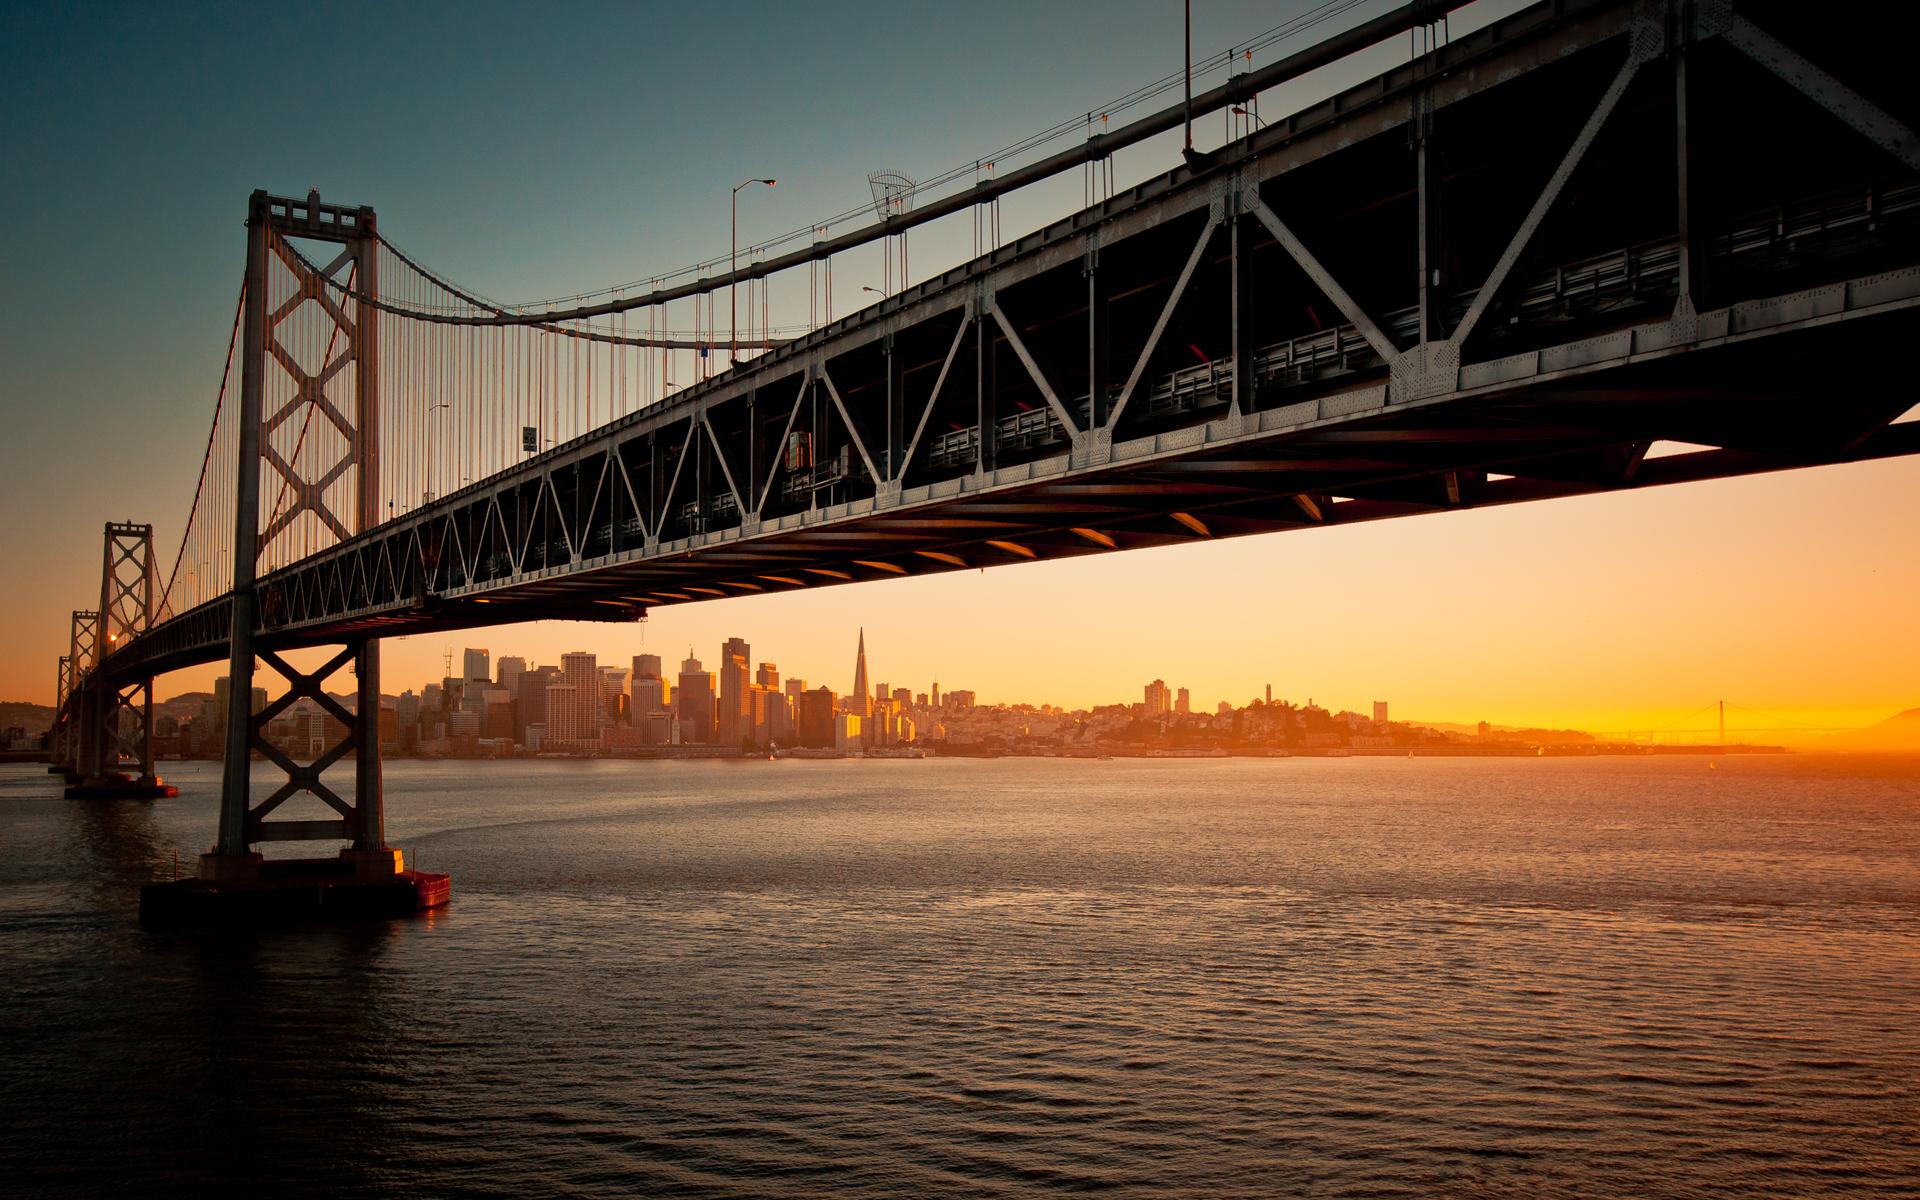 Bridge; Bridge; Bridge; Bridge ...